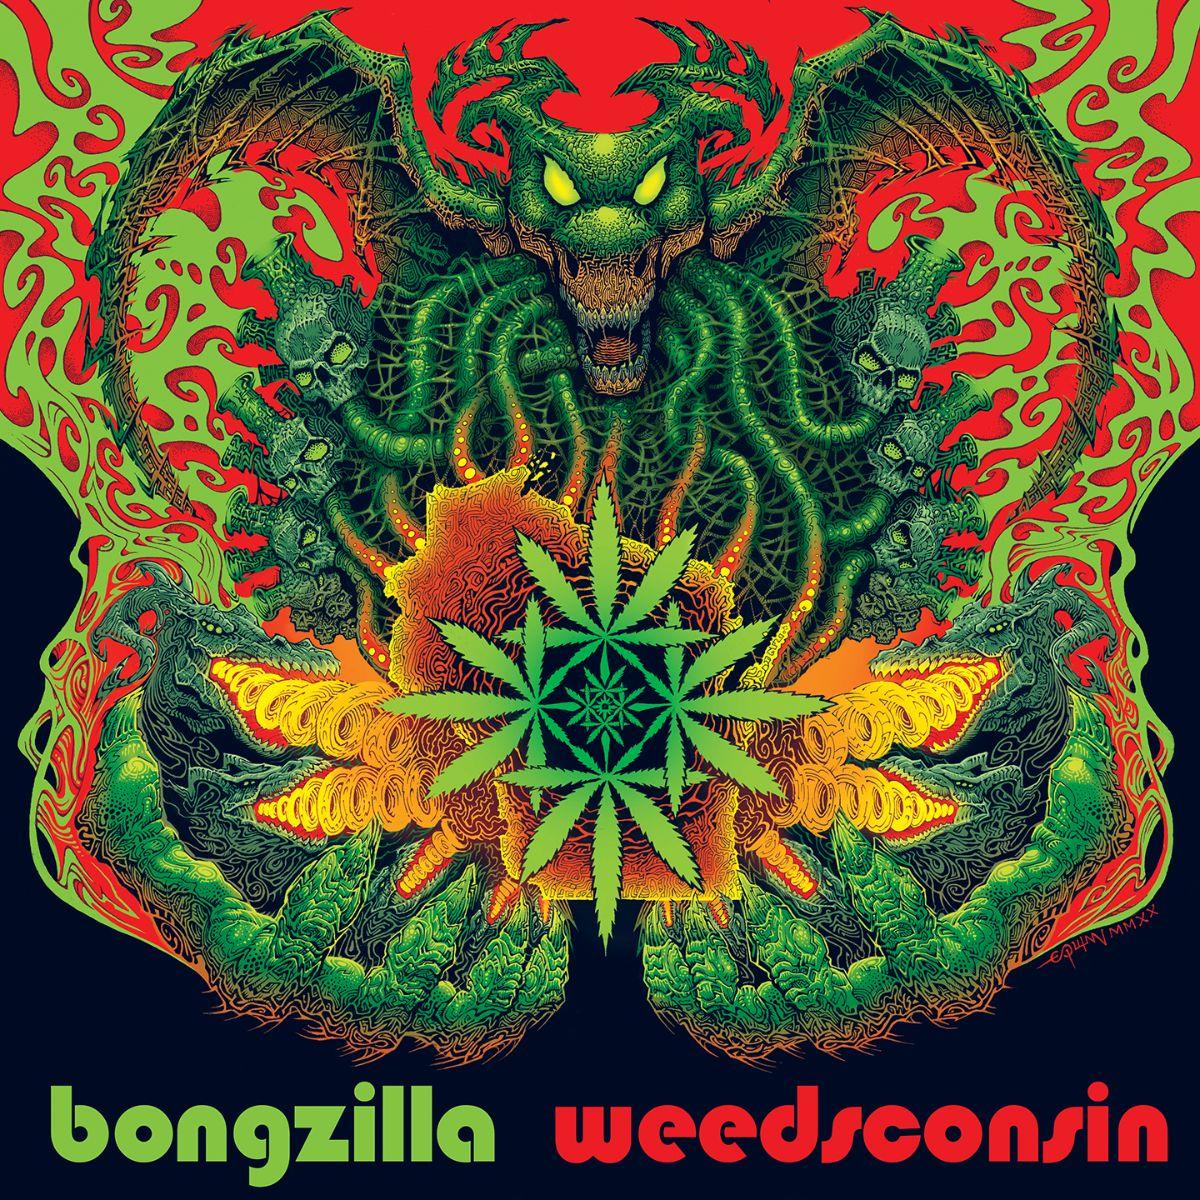 bongzilla weedsconsin